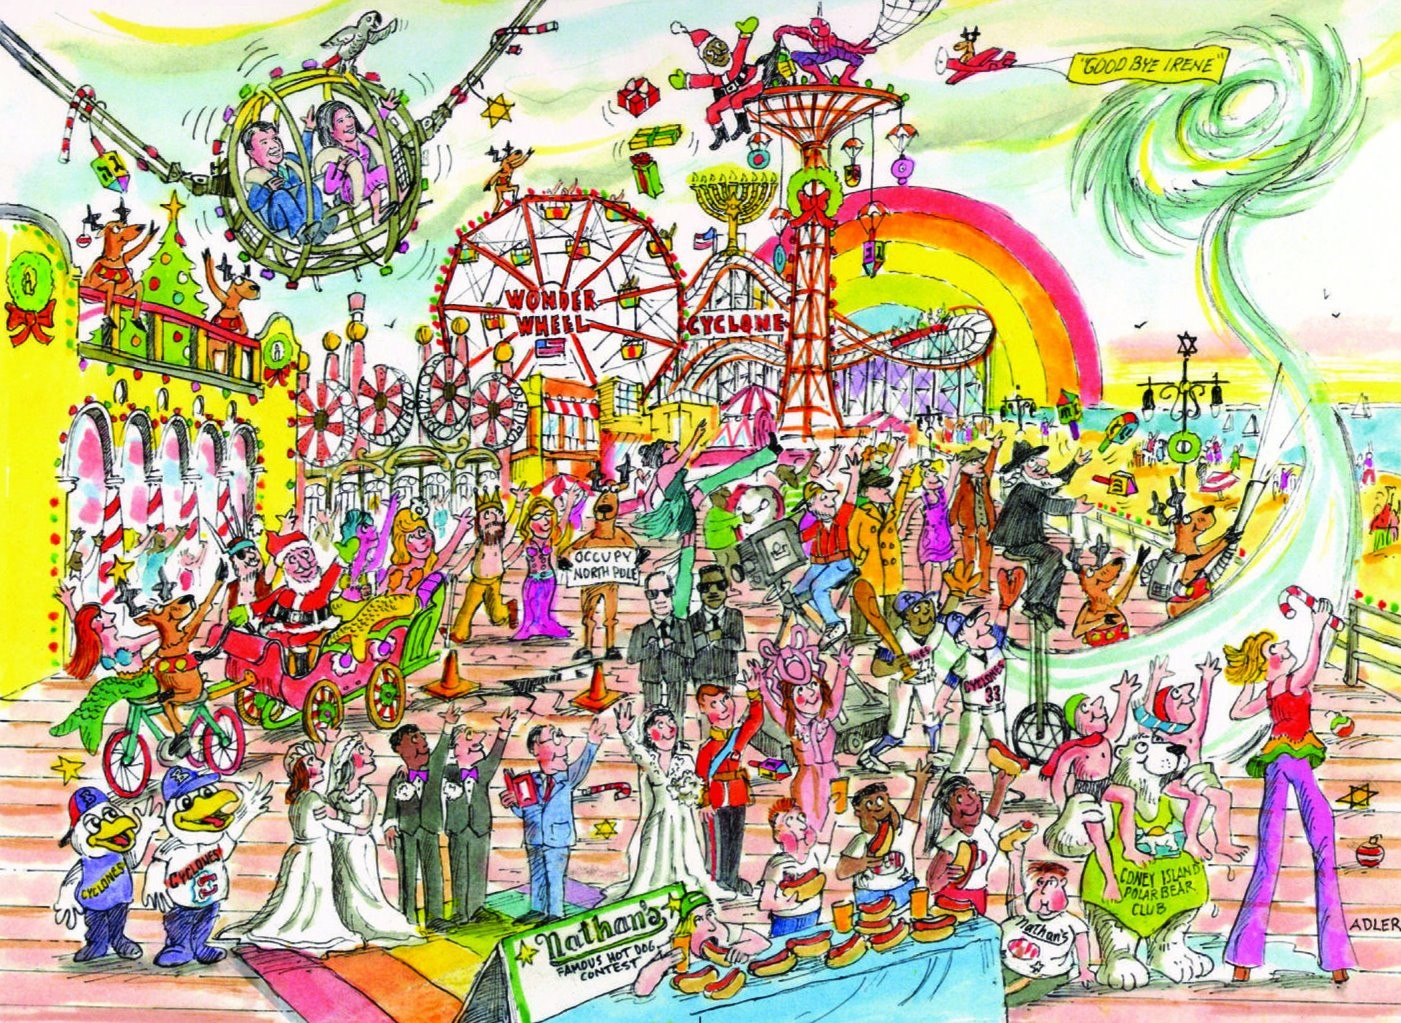 Coney Island Christmas.Happy Holidays From Marty Markowitz A Coney Island